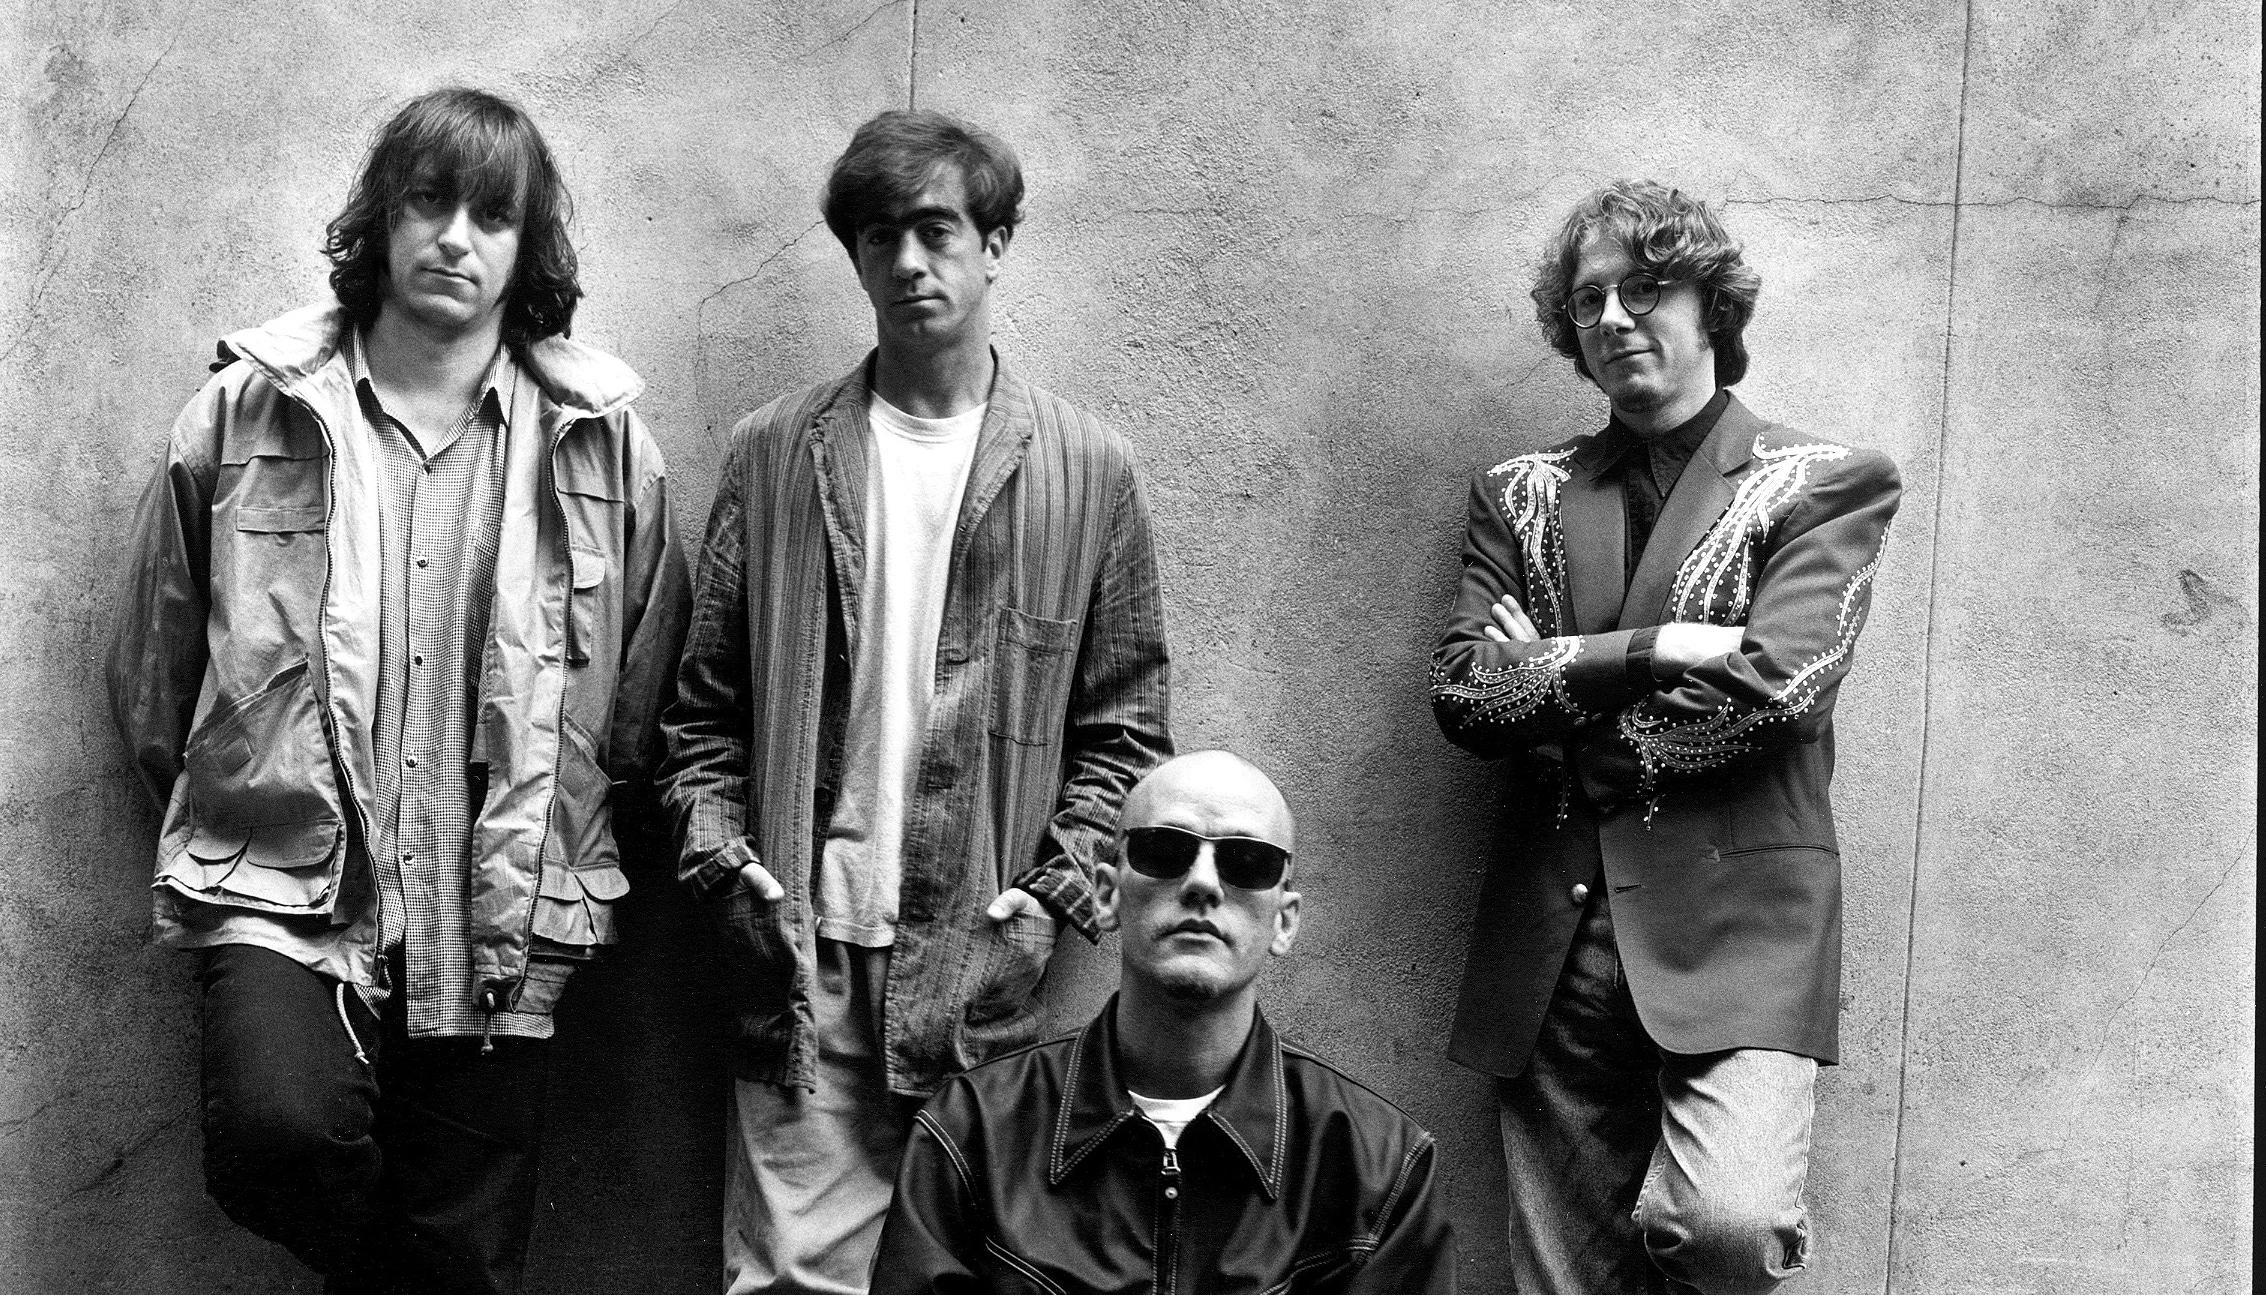 'In Time: The Best of R.E.M. 1988-2003' Brings R.E.M. to Vinyl (ALBUM REVIEW)